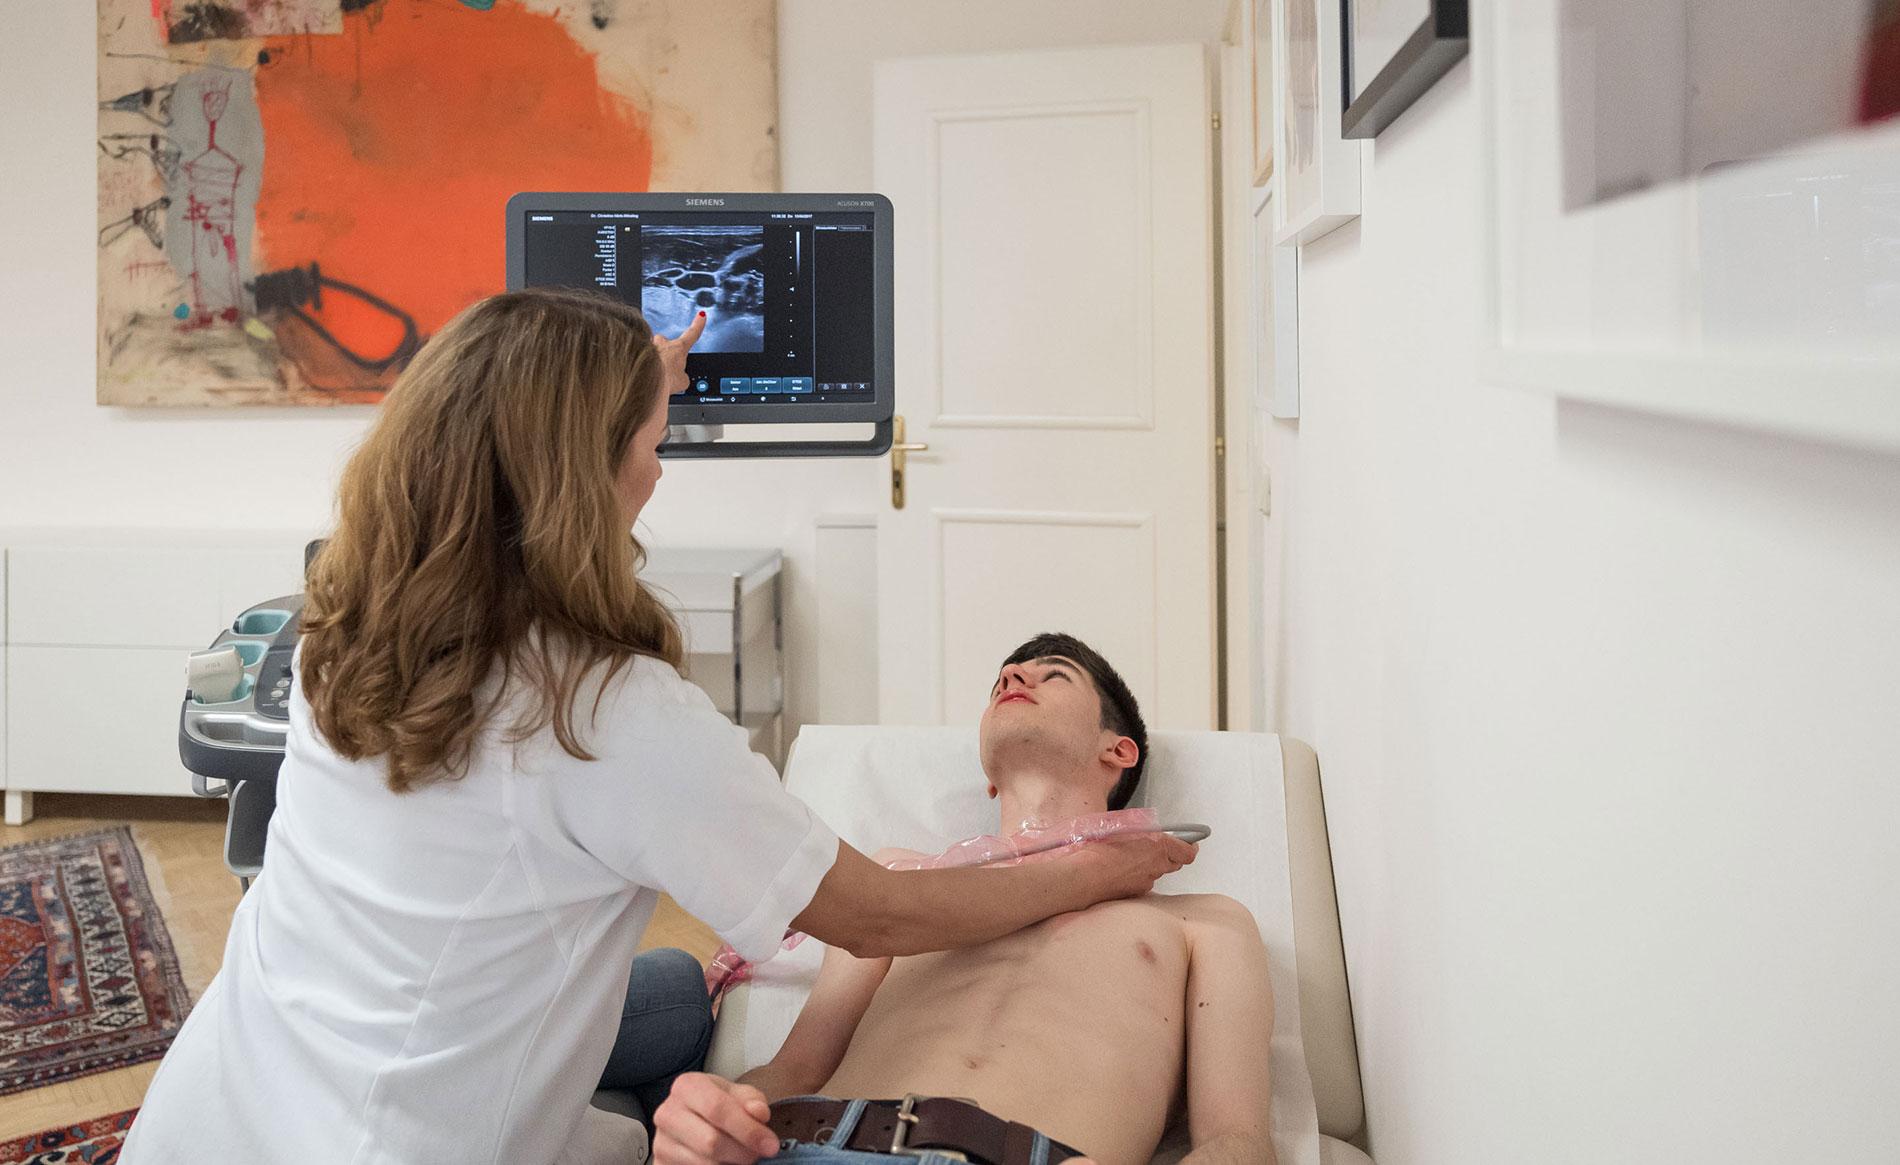 Carotistriplexsonographie - die Internistin